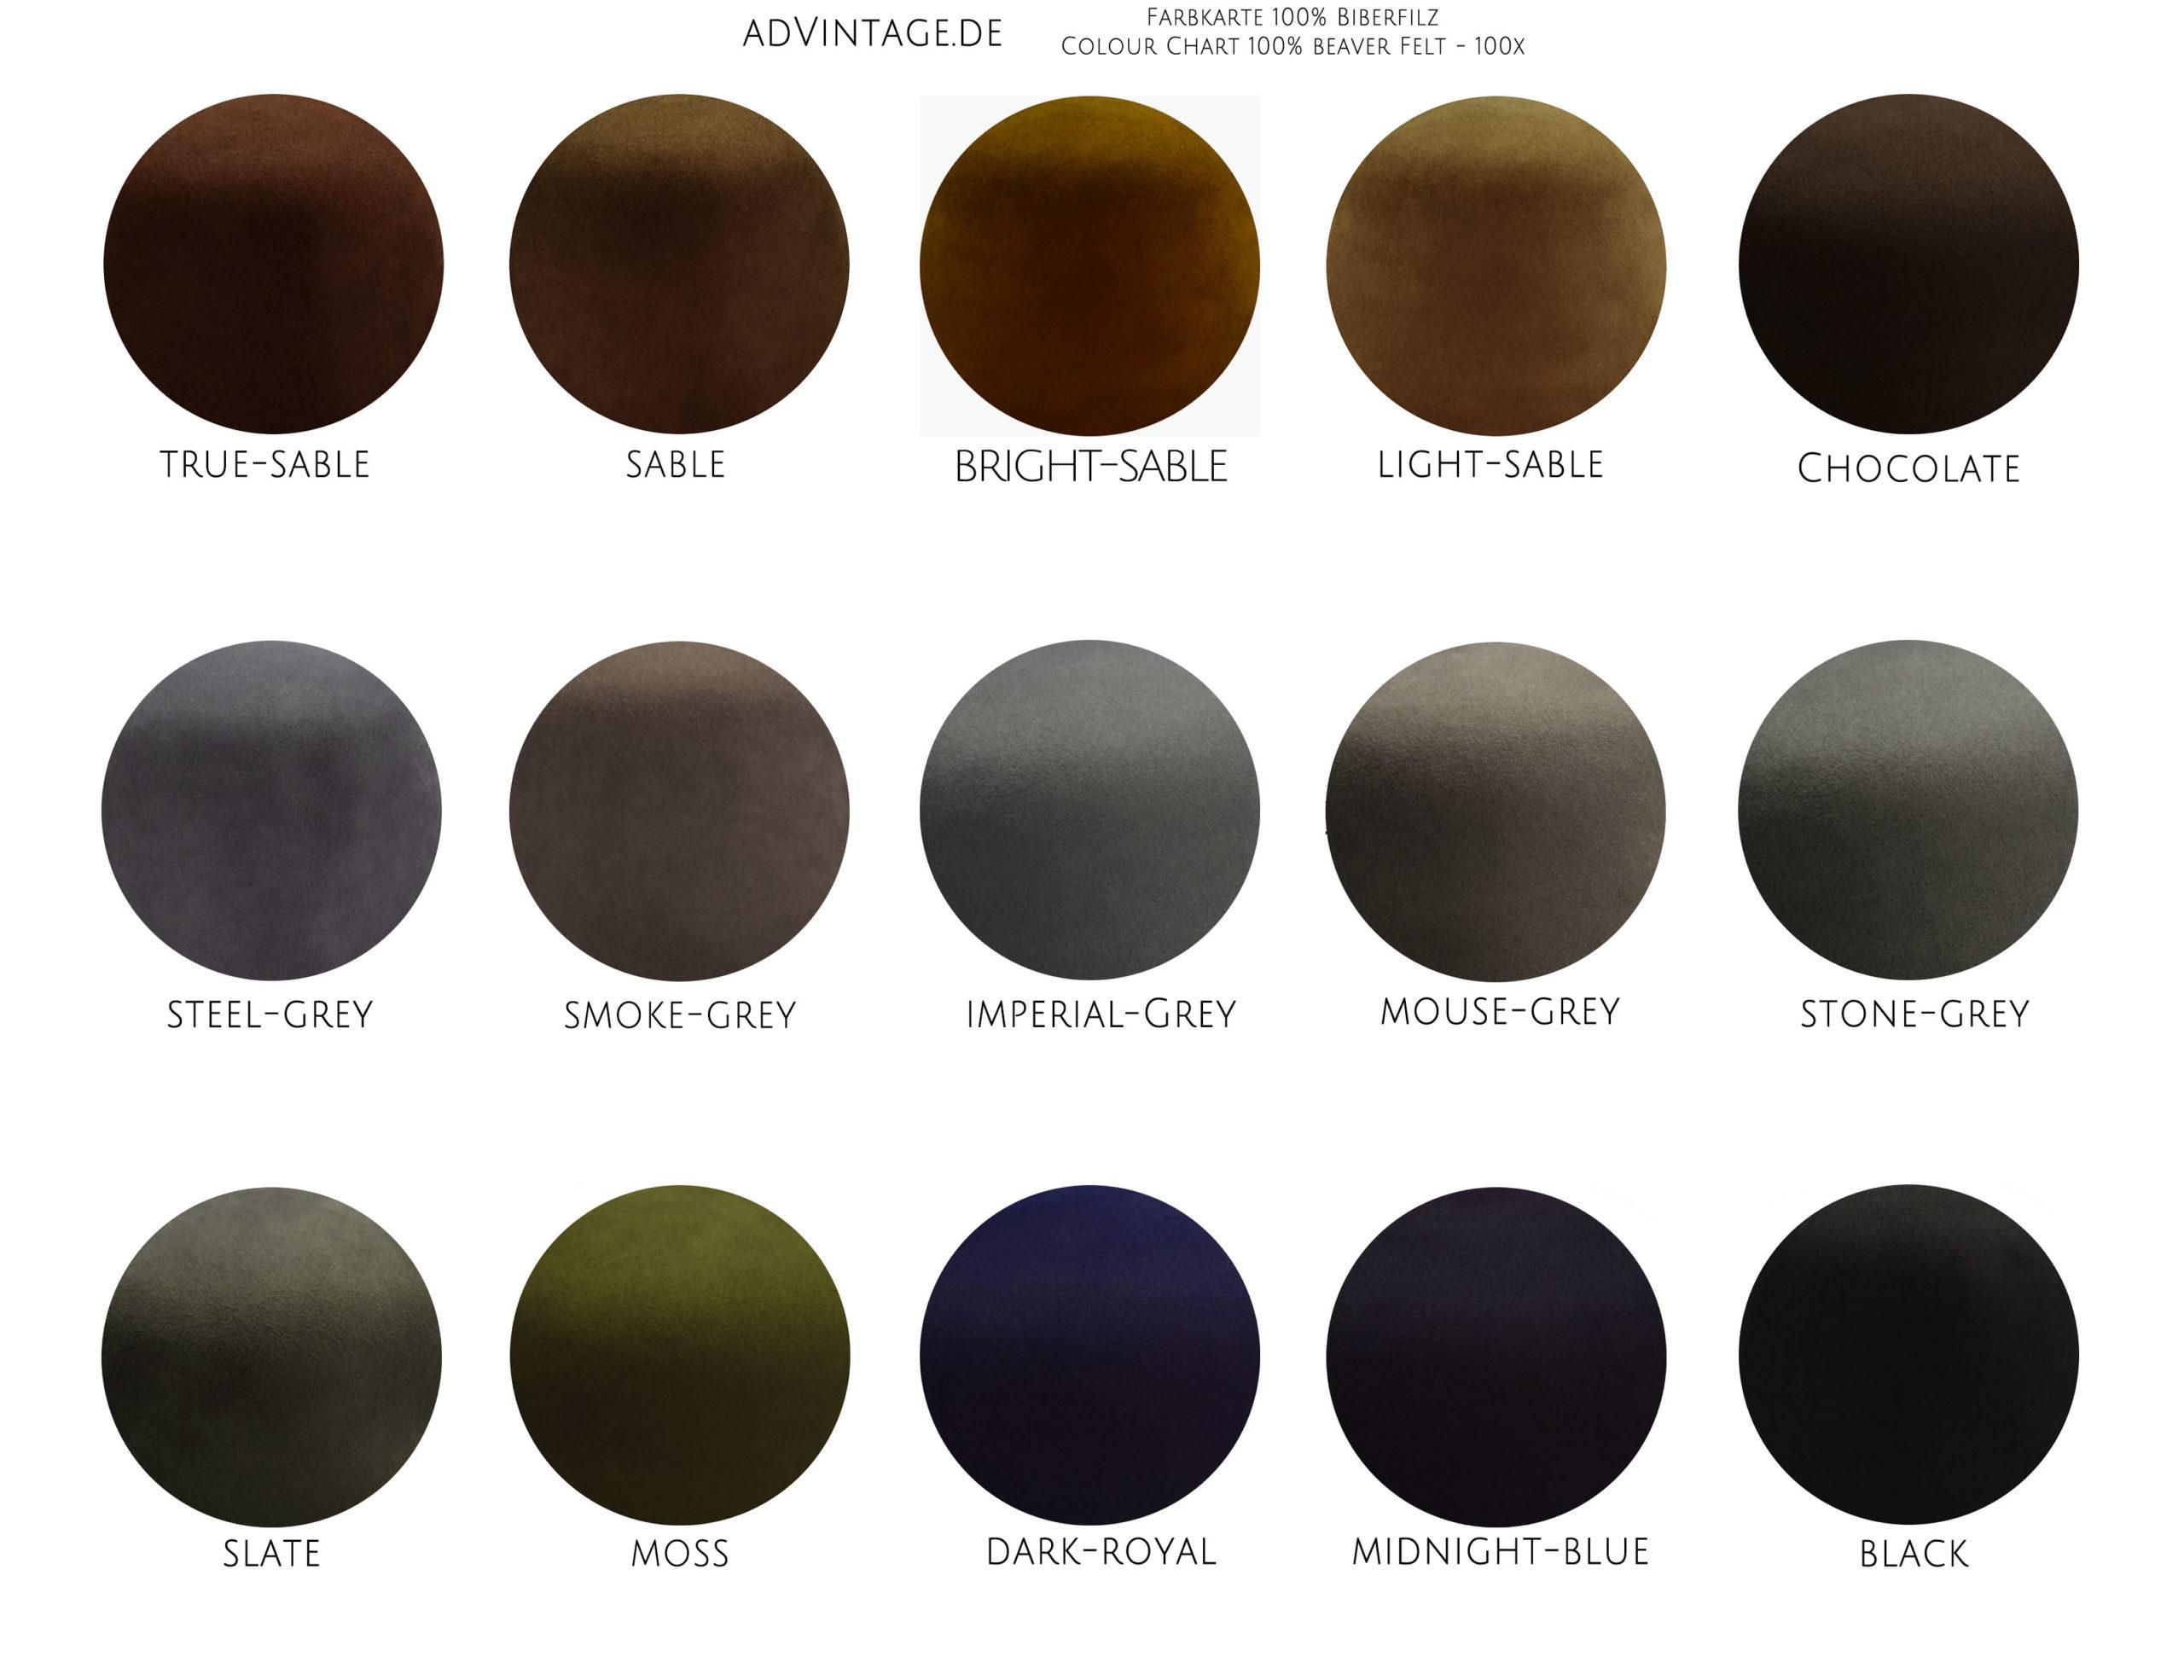 100x beaver felt biber filz fedora hat color chart farben advintage